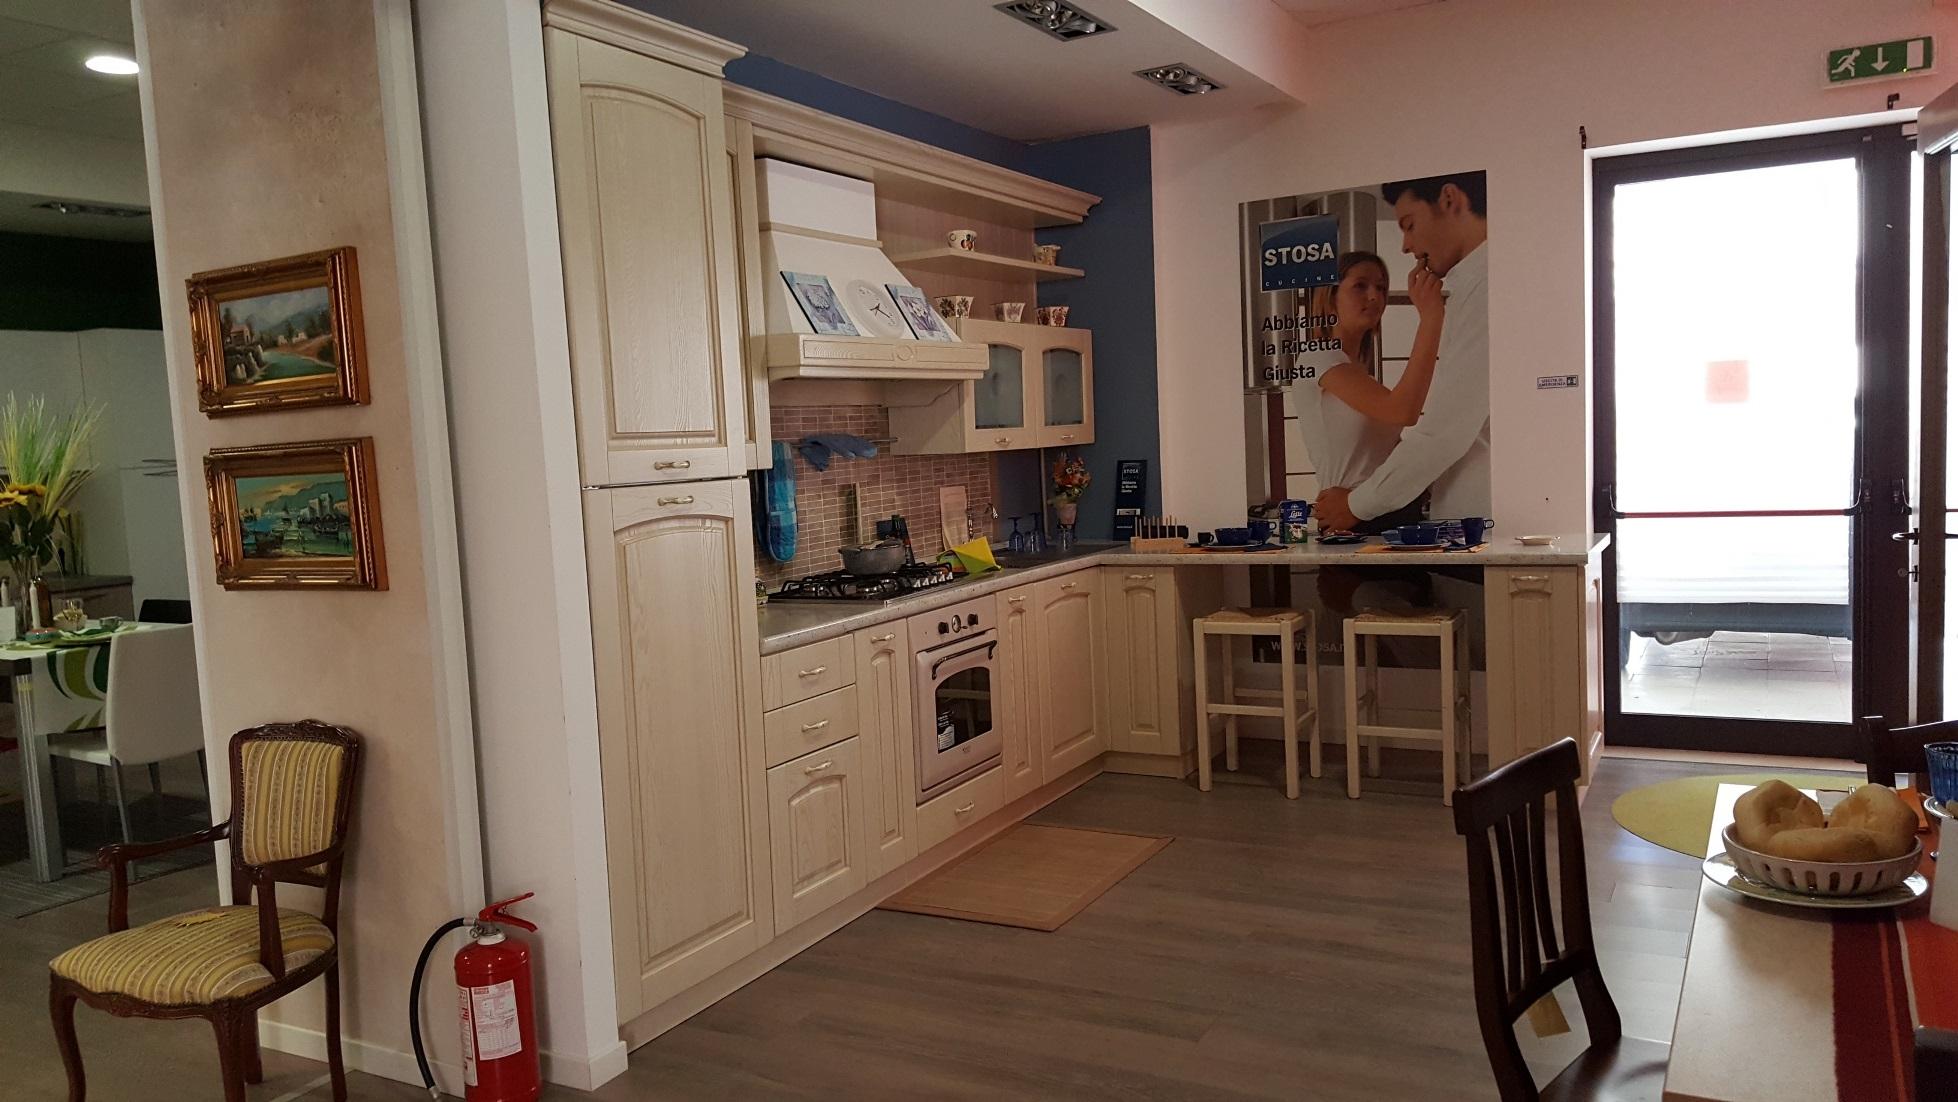 Stosa cucine cucina ginevra laccata stosa cucine scontato for Cucine outlet